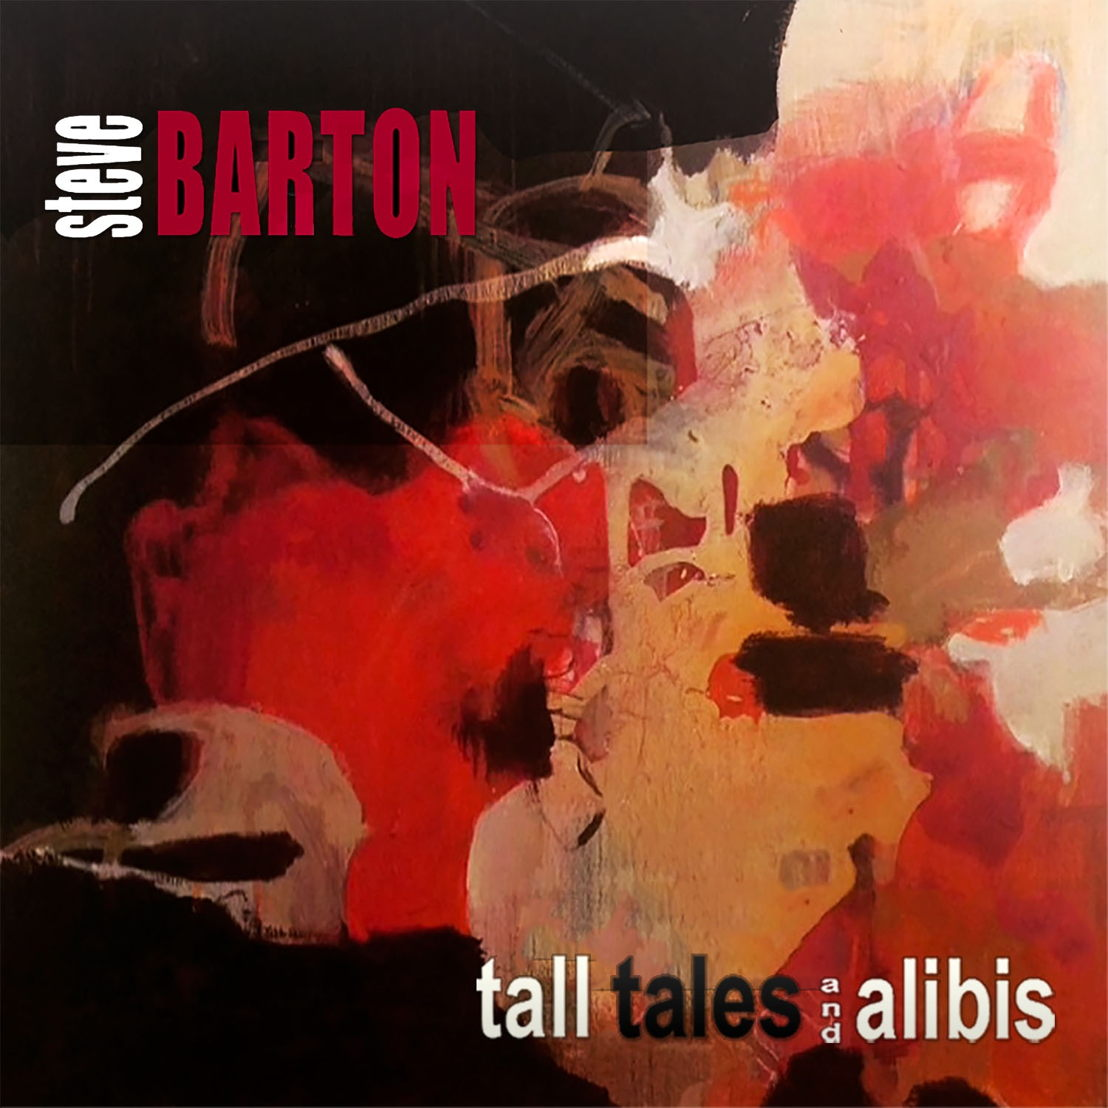 Tall Tales & Alibis - Steve Barton (sleeve art)